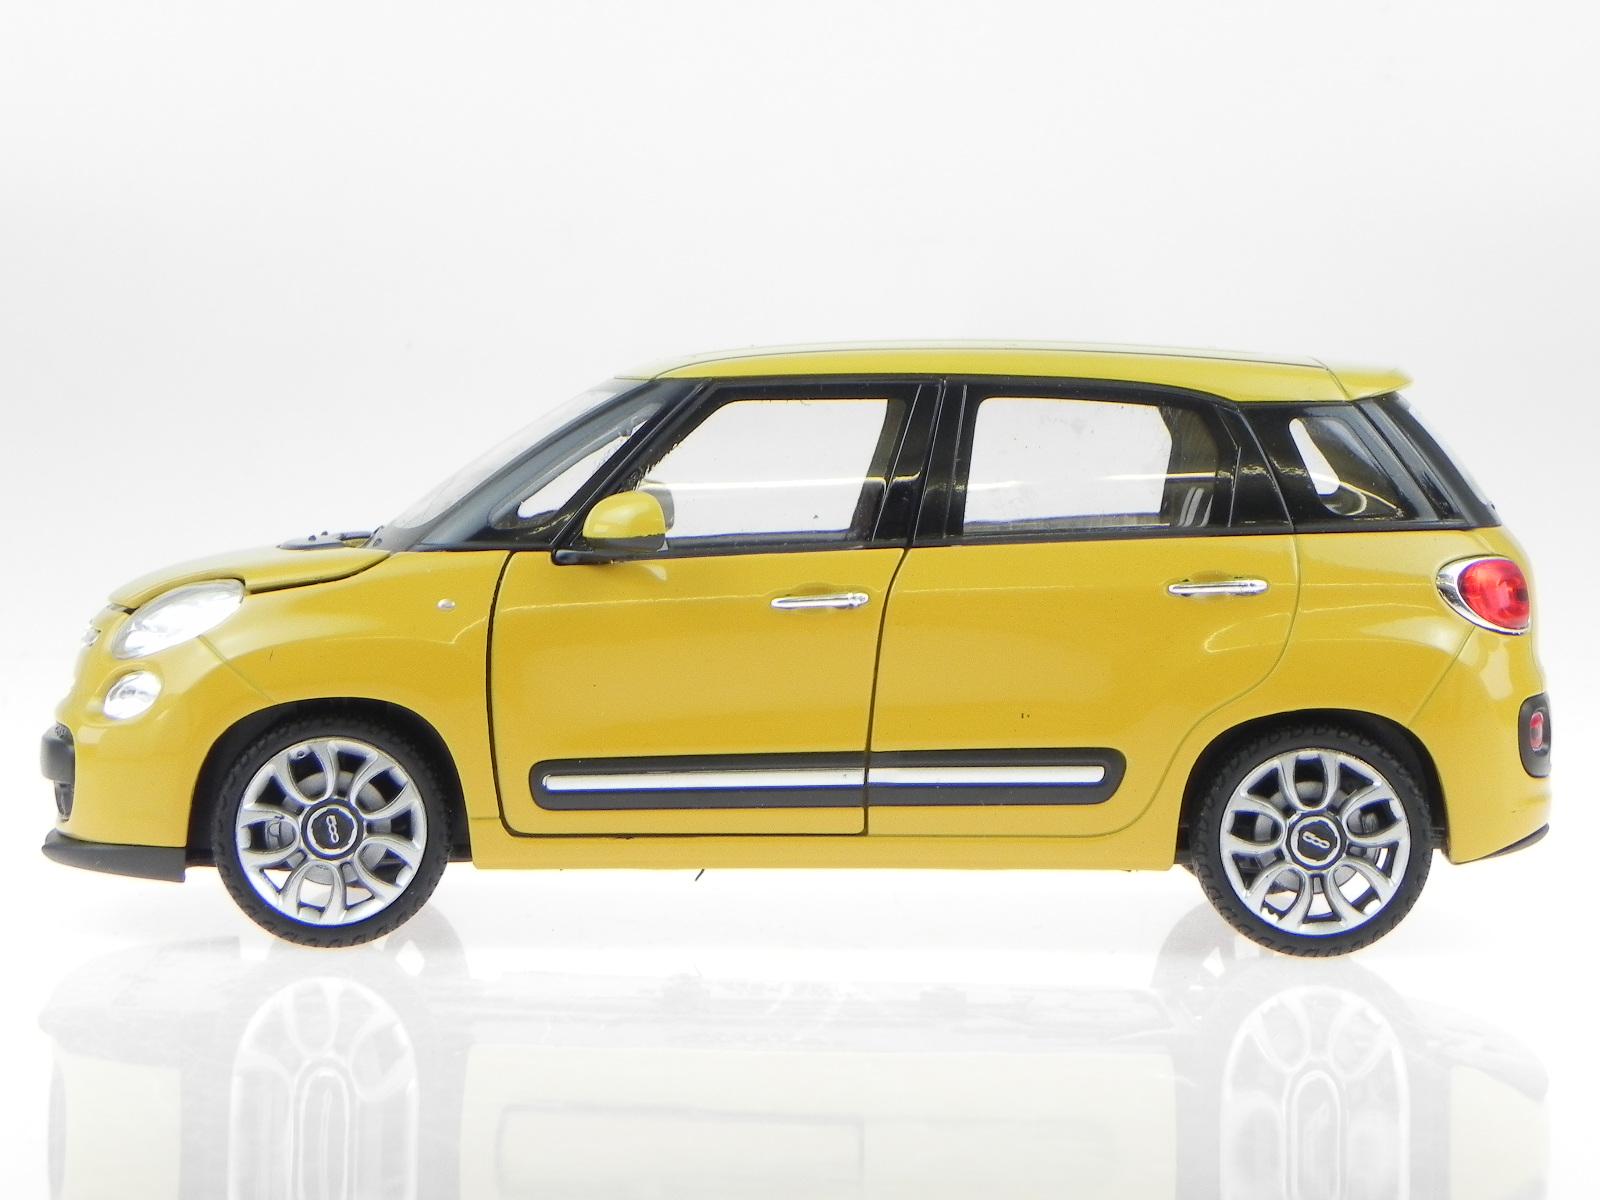 fiat 500l 500 l minivan 2013 gelb modellauto 24038 welly 1. Black Bedroom Furniture Sets. Home Design Ideas